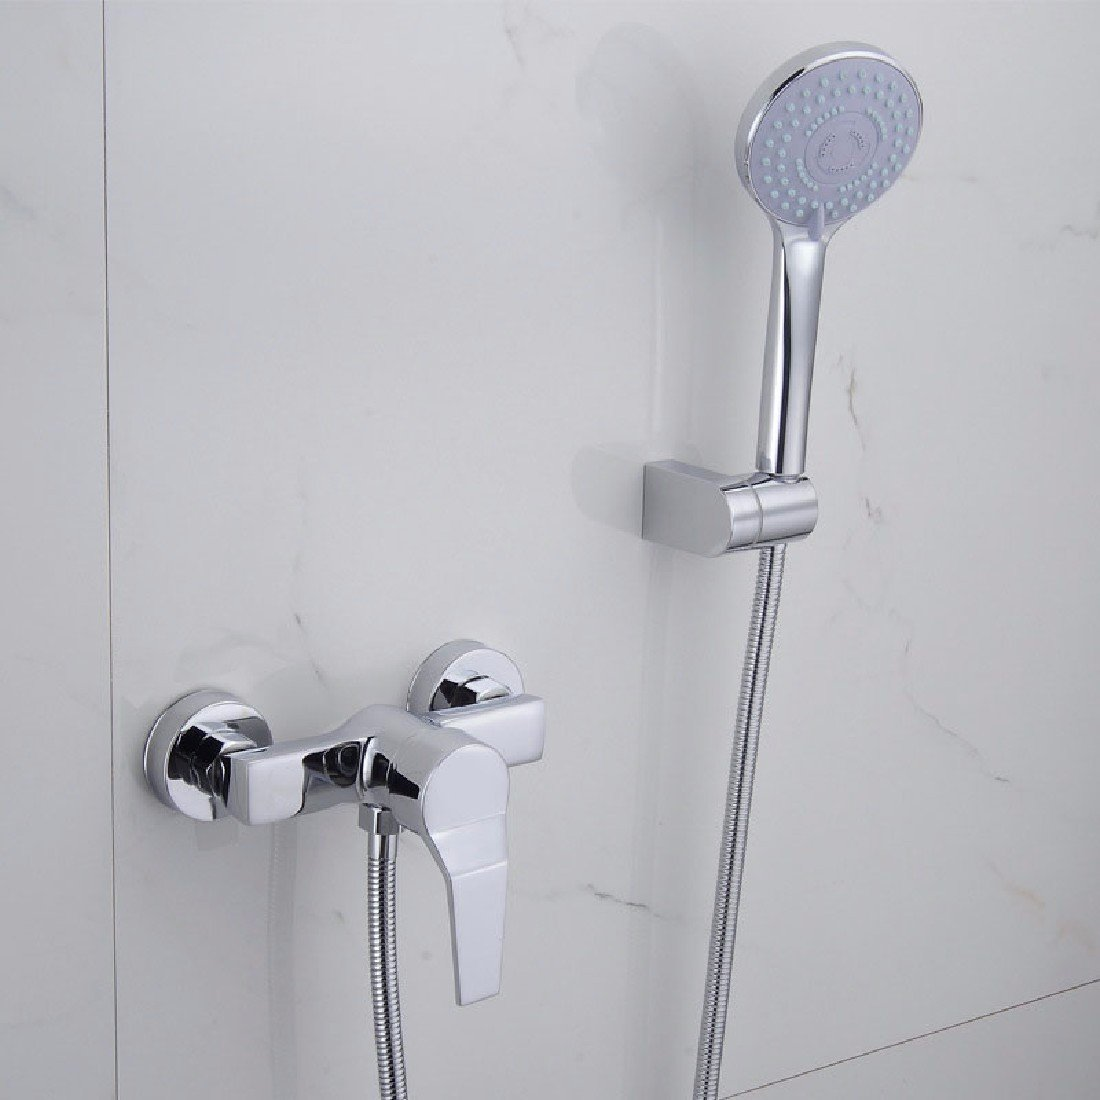 WAWZJ Bathroom Shower Set Simple Shower Shower Head